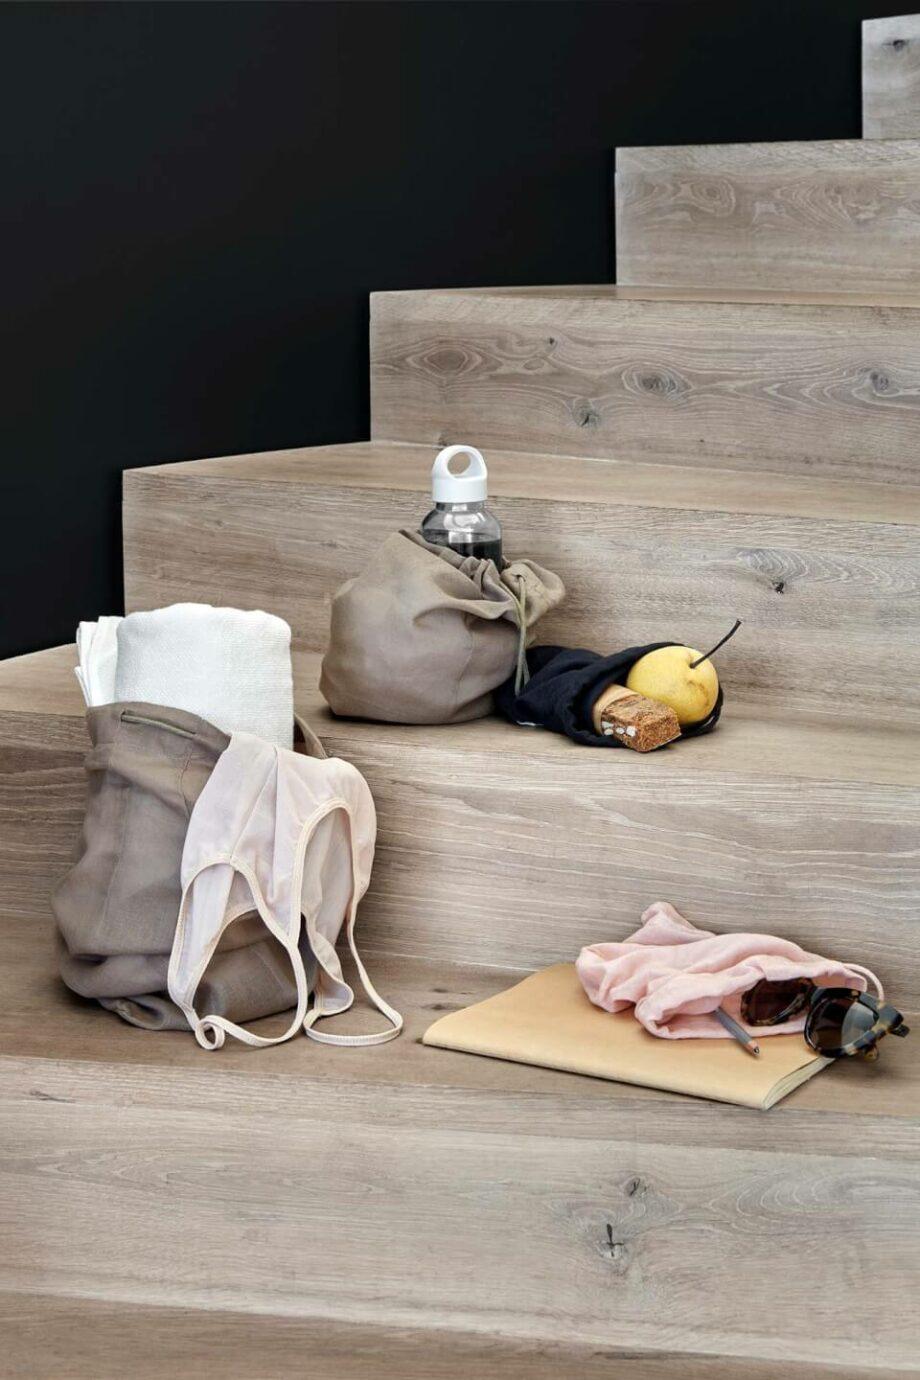 All Purpose bag clay en stone rose katoenen bewaarzak van the organic company byjensen